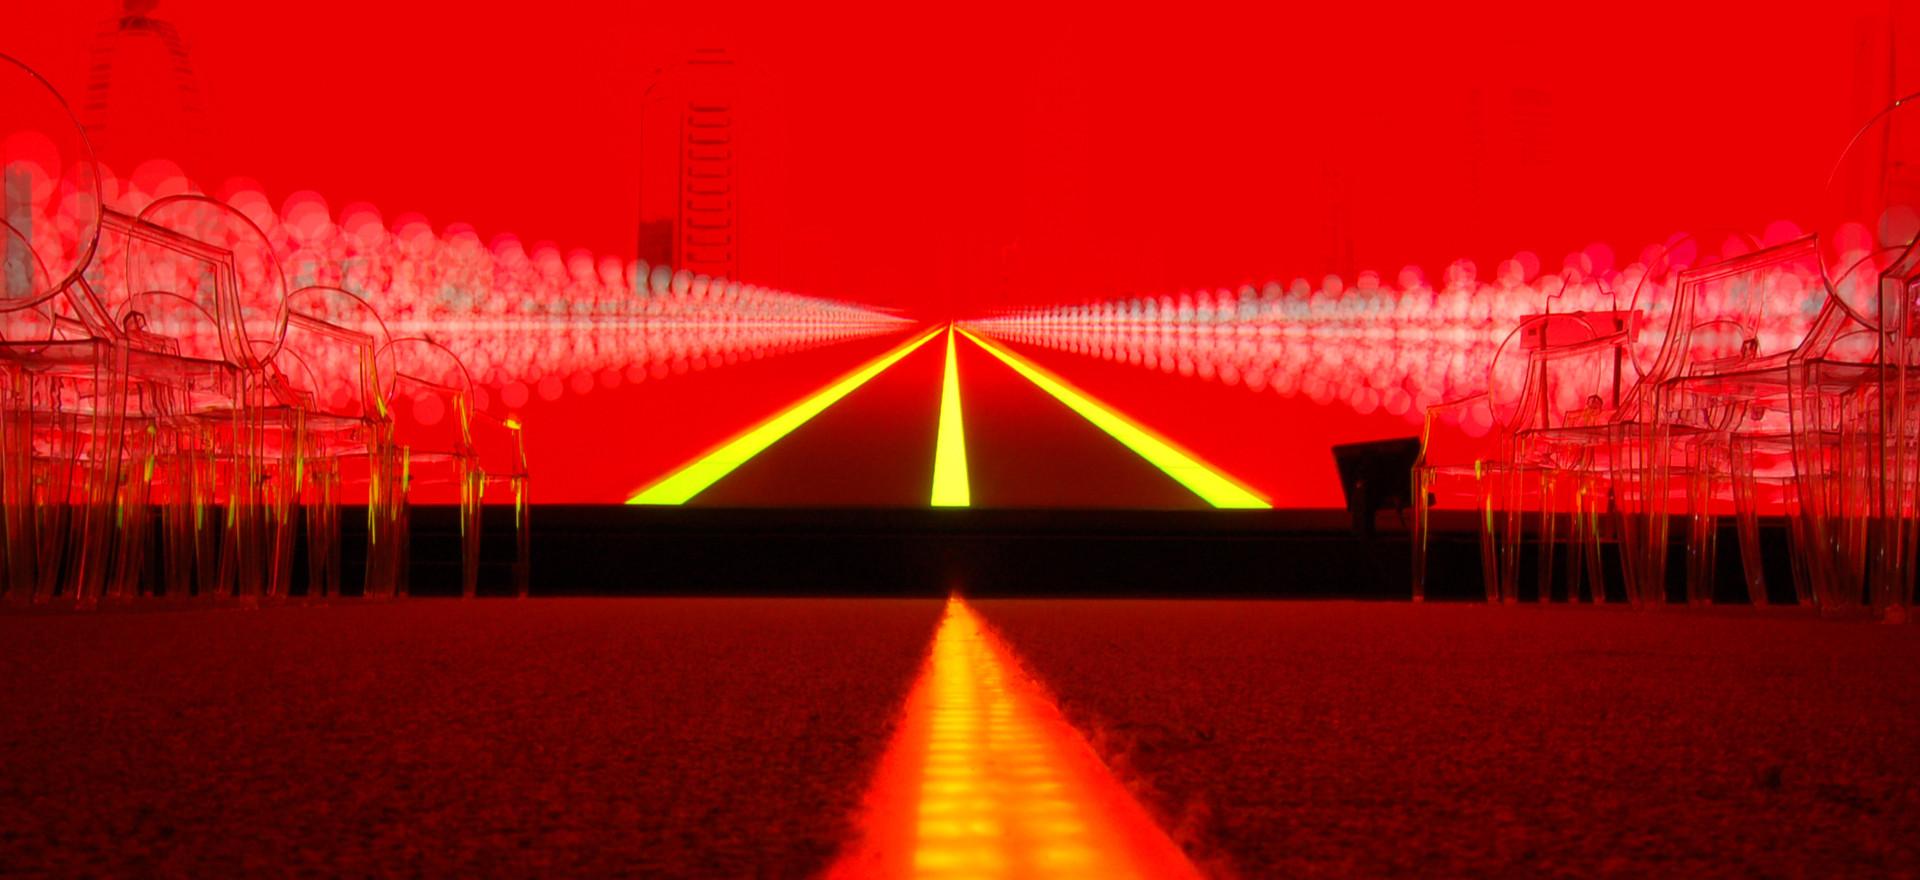 Proiezioni video e light design | Video projection and light design